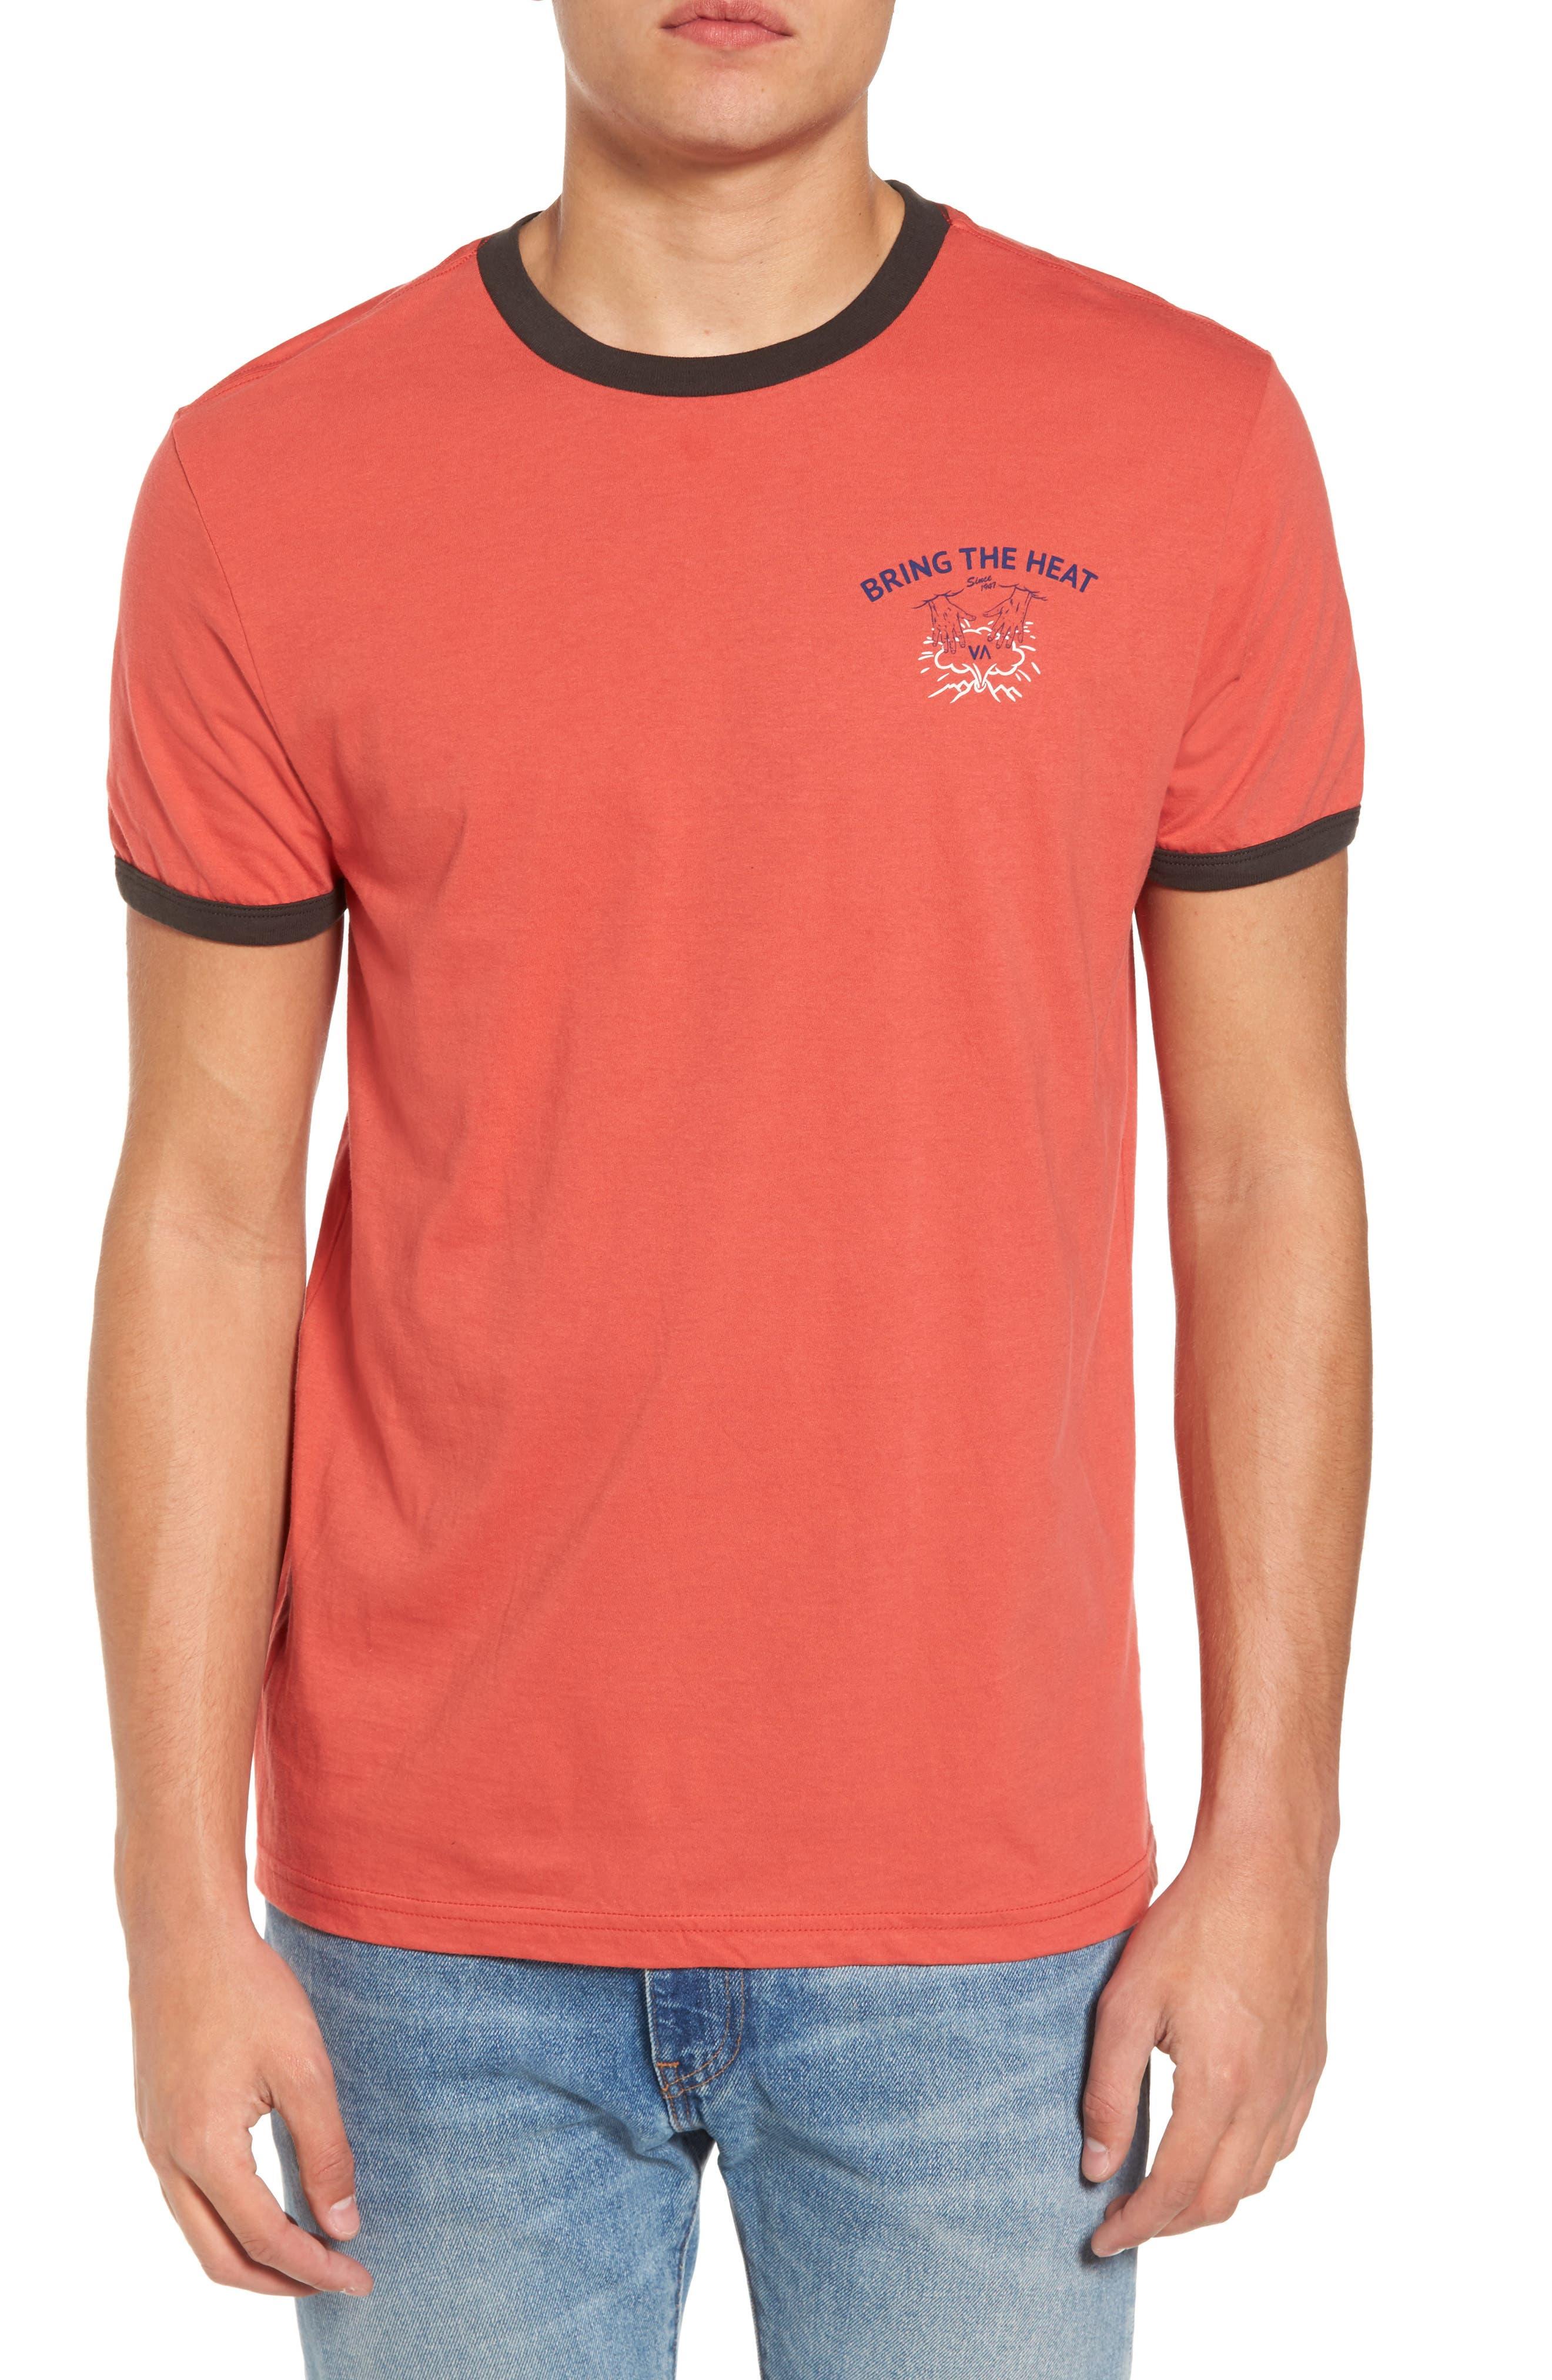 Bringing the Heat T-Shirt,                             Main thumbnail 1, color,                             Rosewood